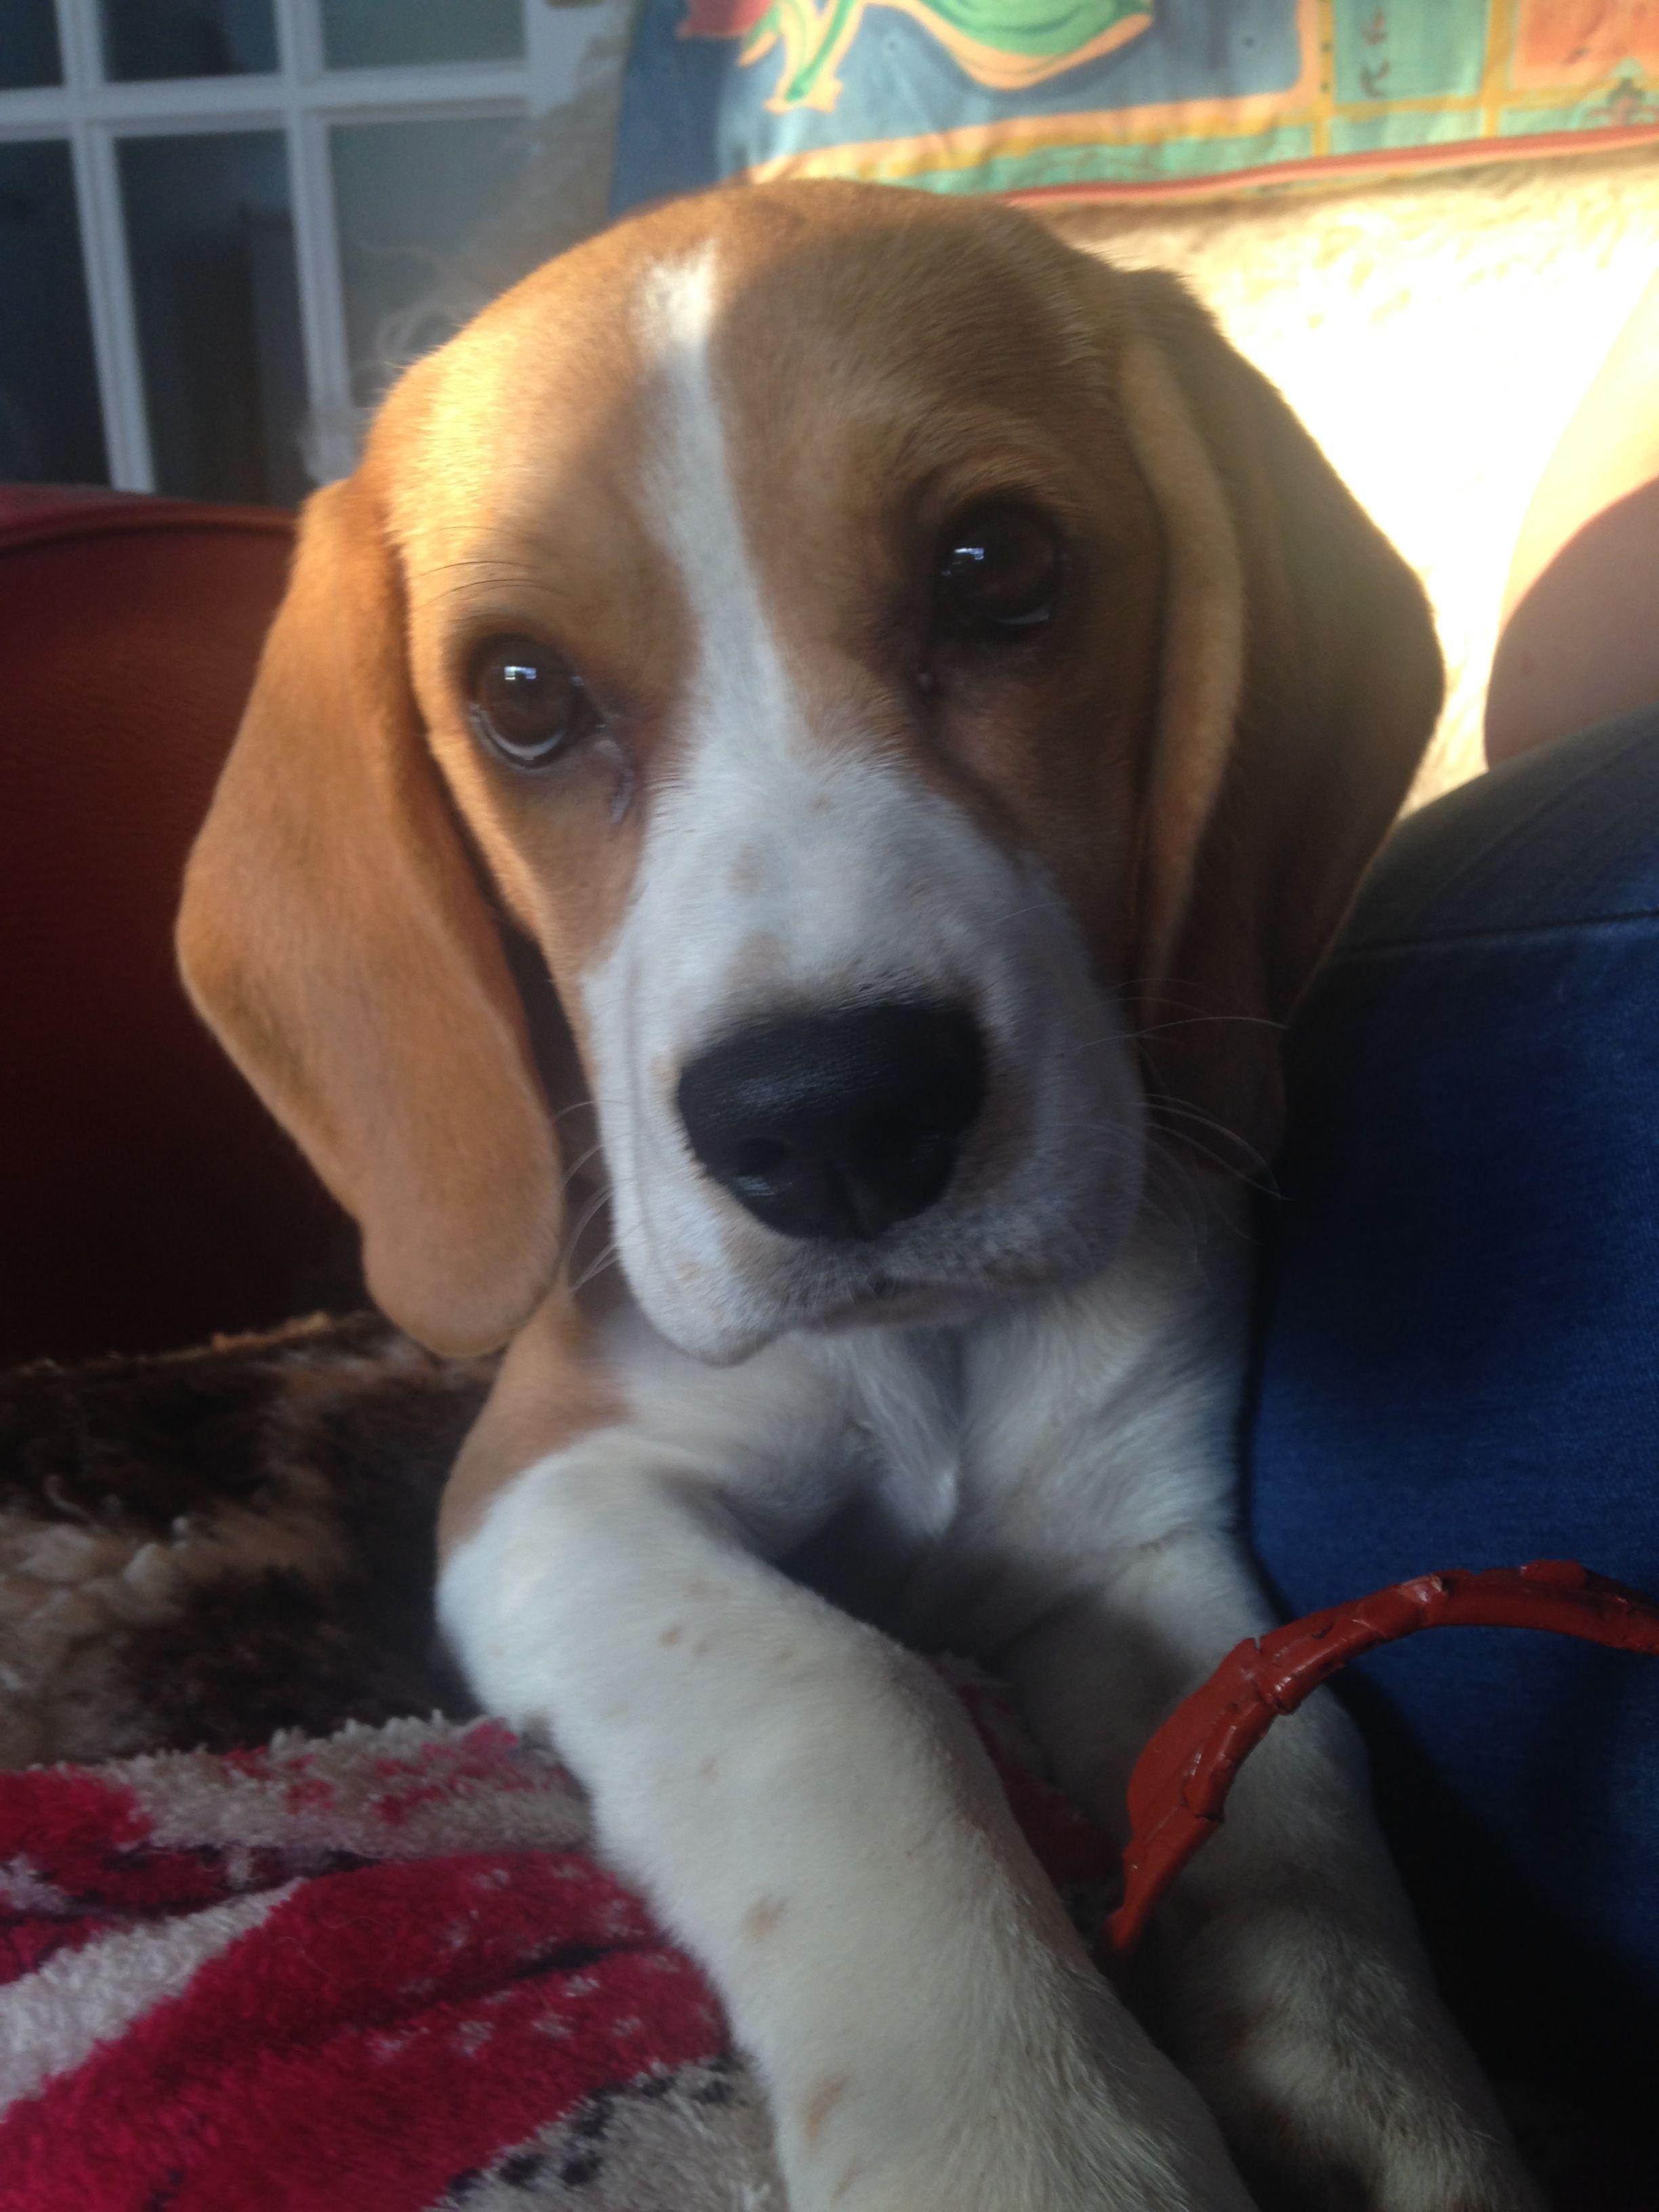 Beagle Friendly And Curious Beagle Puppy Cute Beagles Beagle Dog